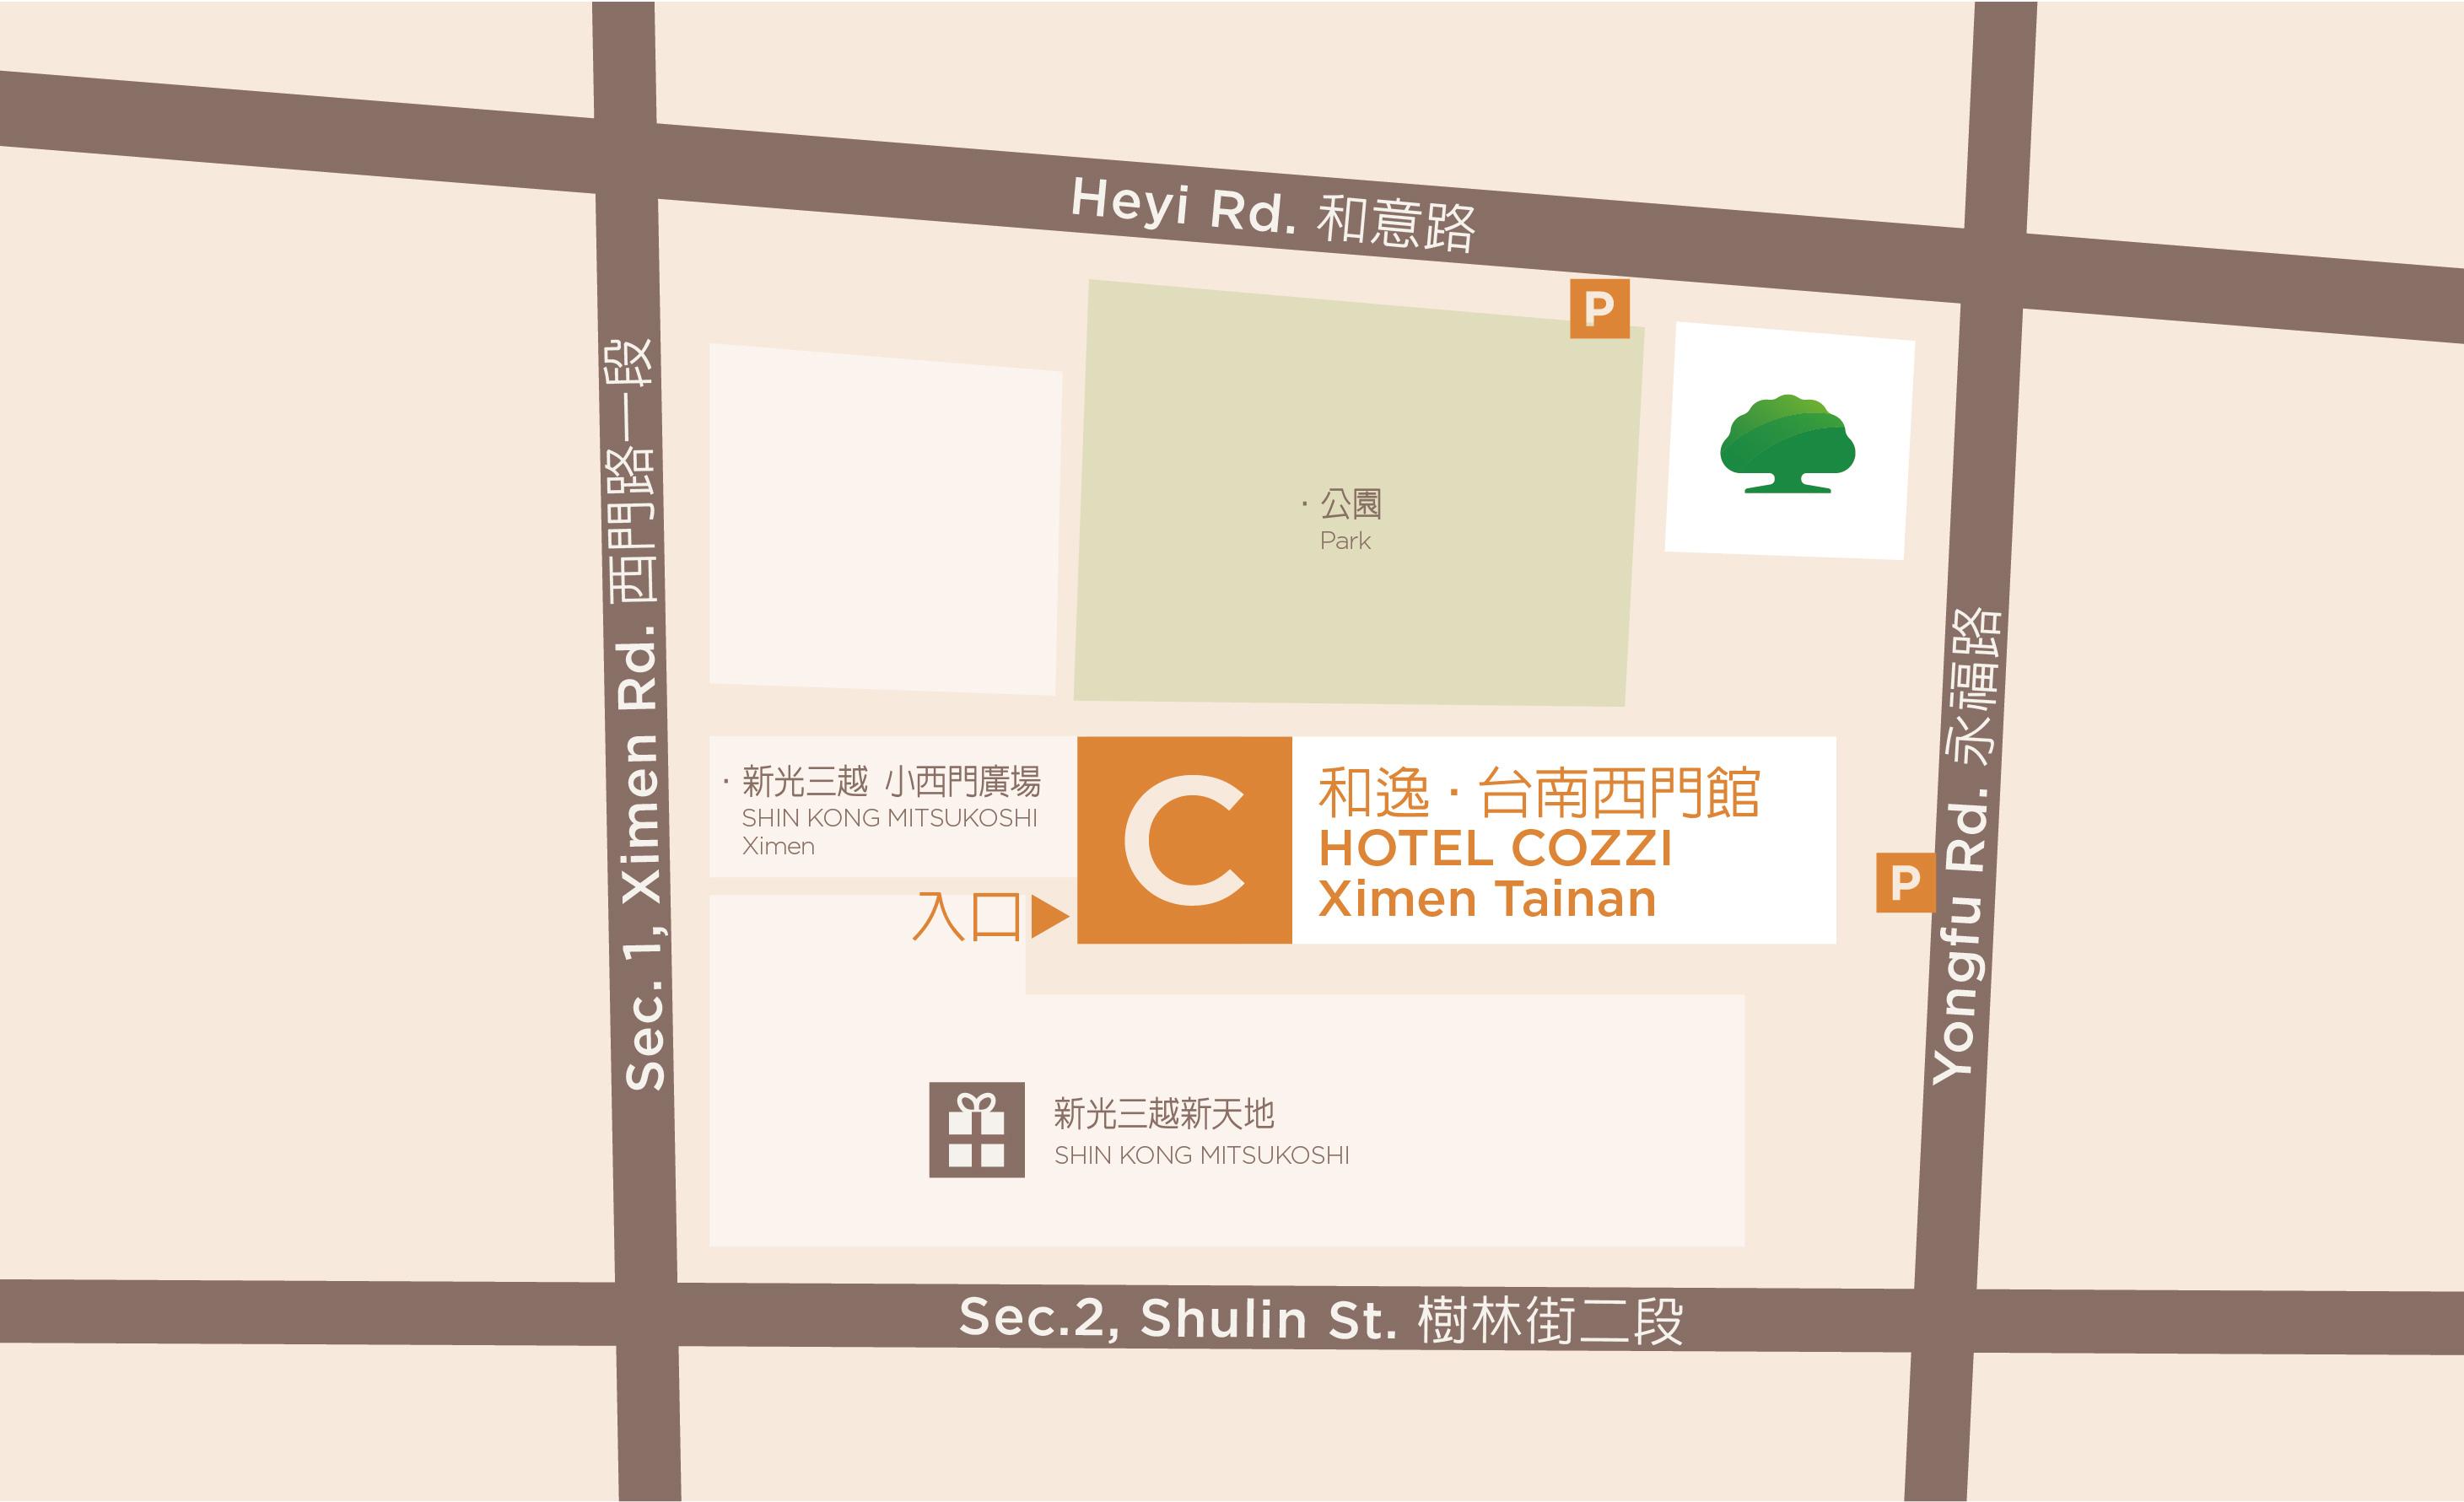 CZ03交通資訊-地圖 -02